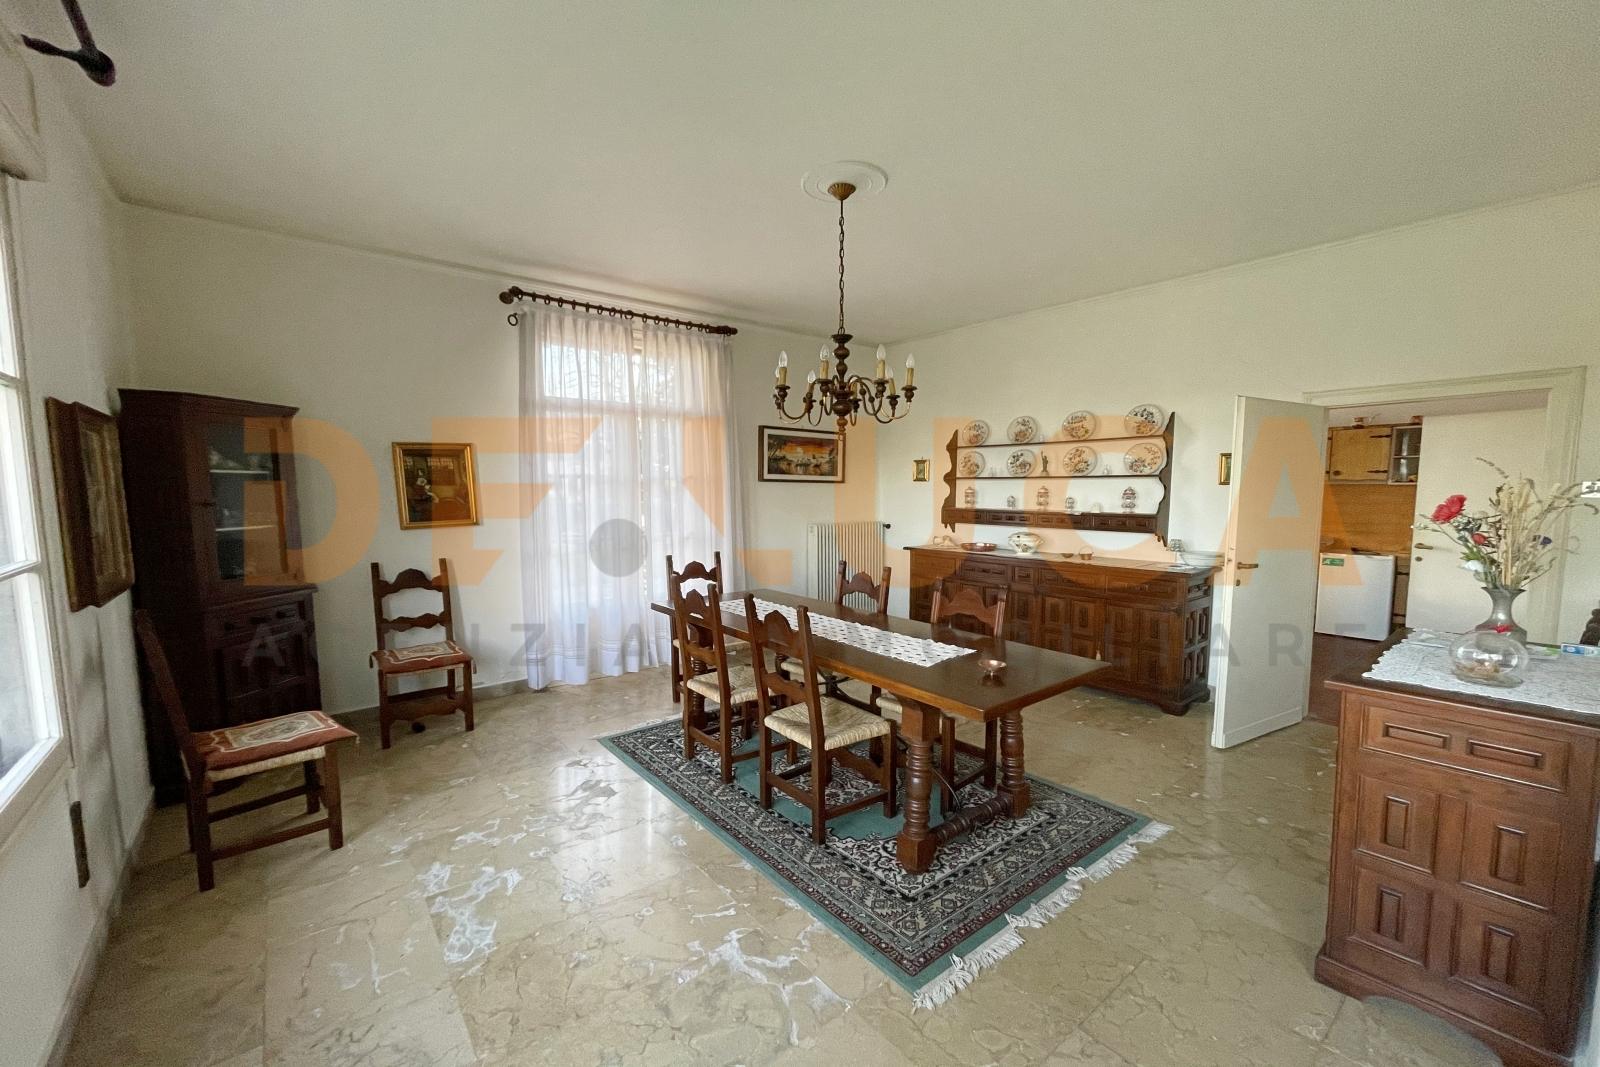 Villa singola, Fossalta di Portogruaro - Agenzia De Luca